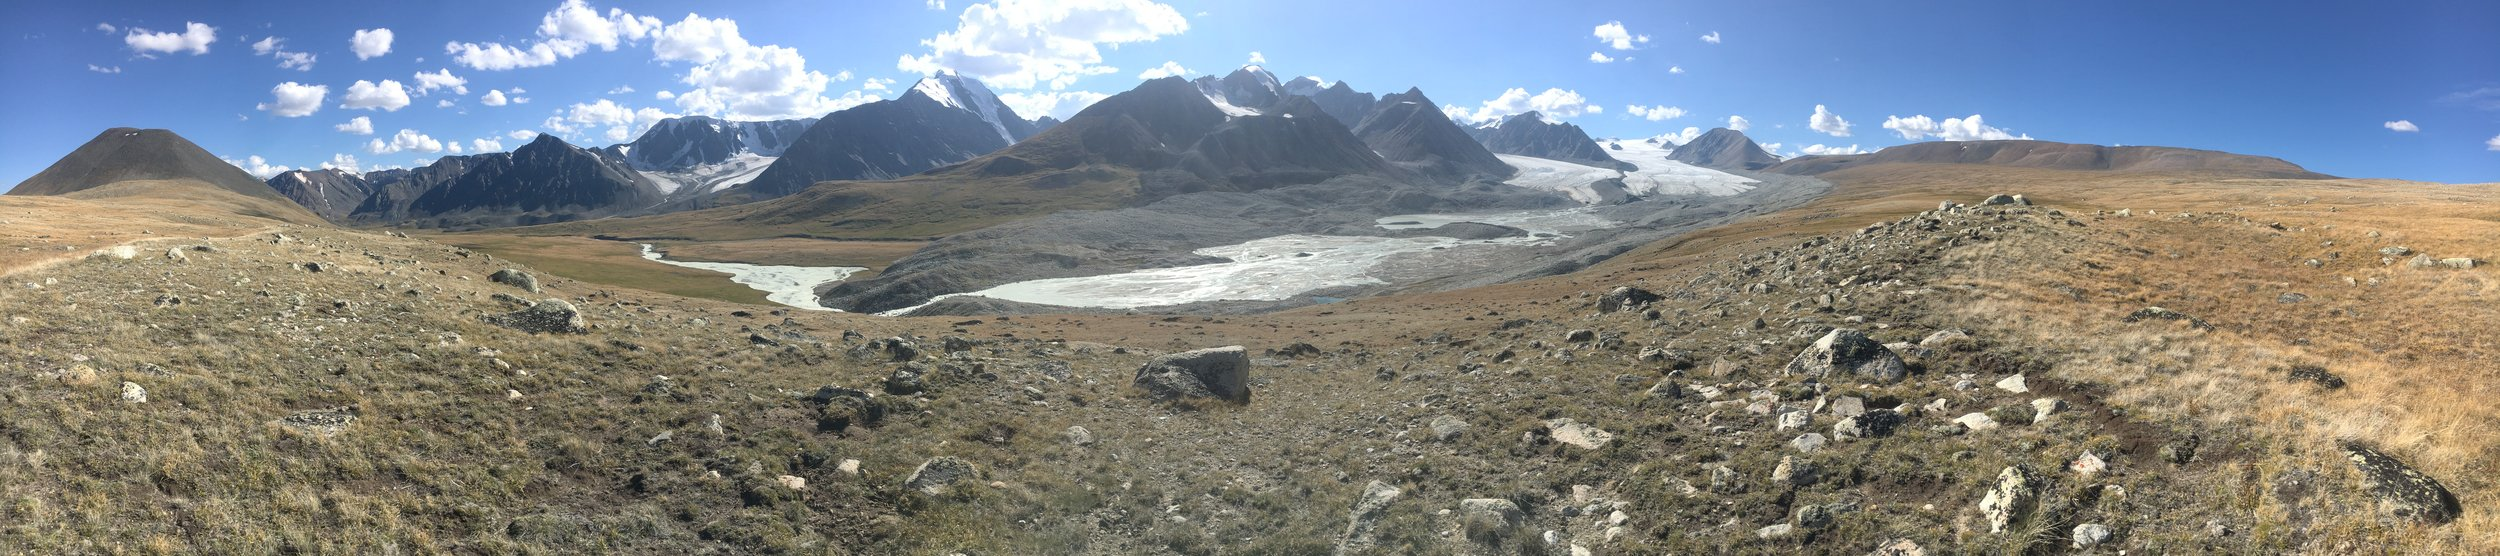 Tavan Bogd National Park - Potanin Glacier and Five Sacred Peaks, Mongolia